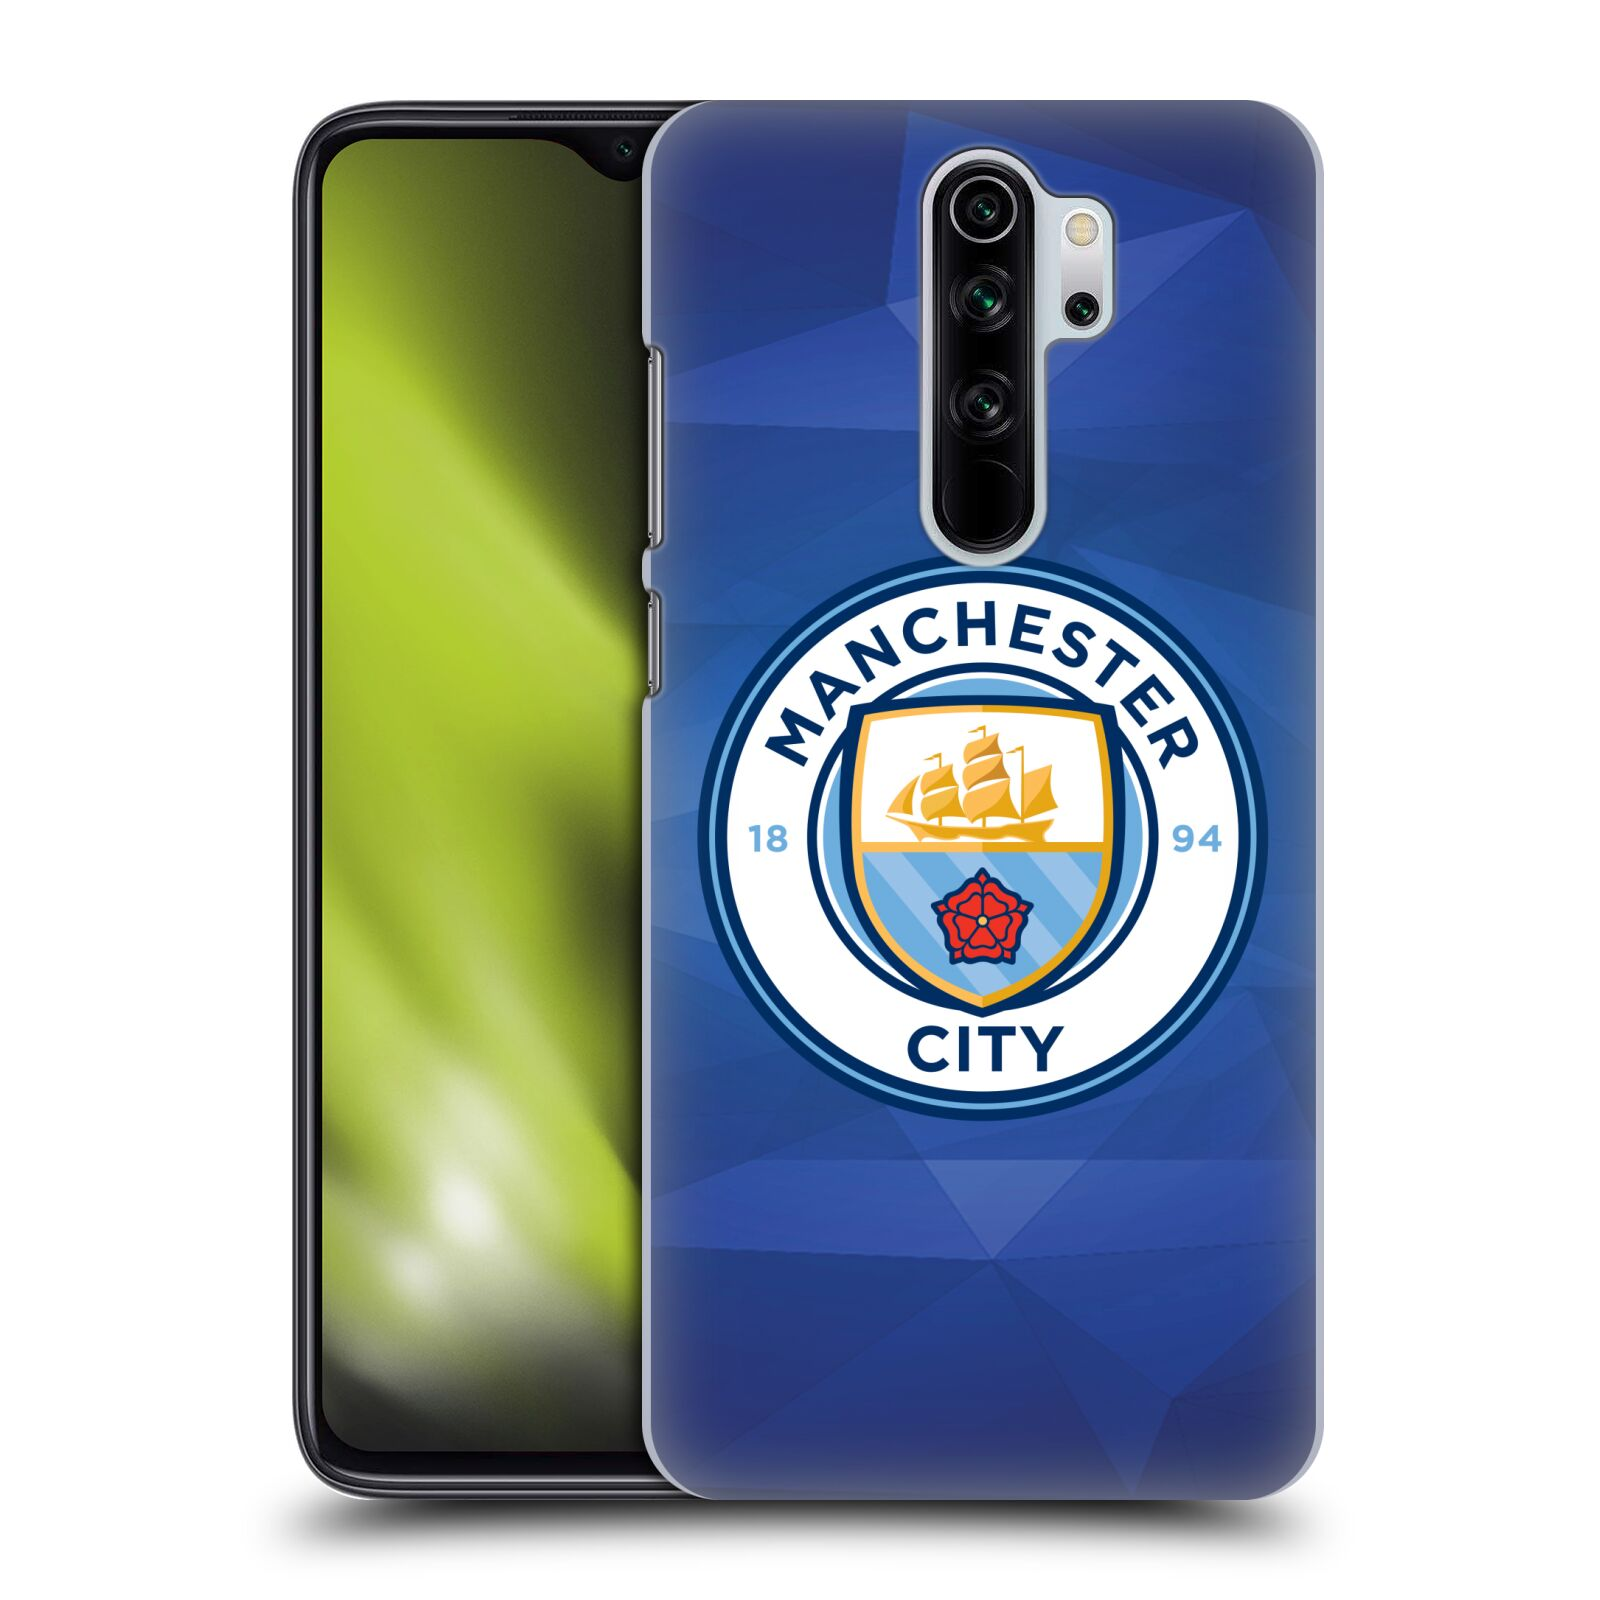 Plastové pouzdro na mobil Xiaomi Redmi Note 8 Pro - Head Case - Manchester City FC - Modré nové logo